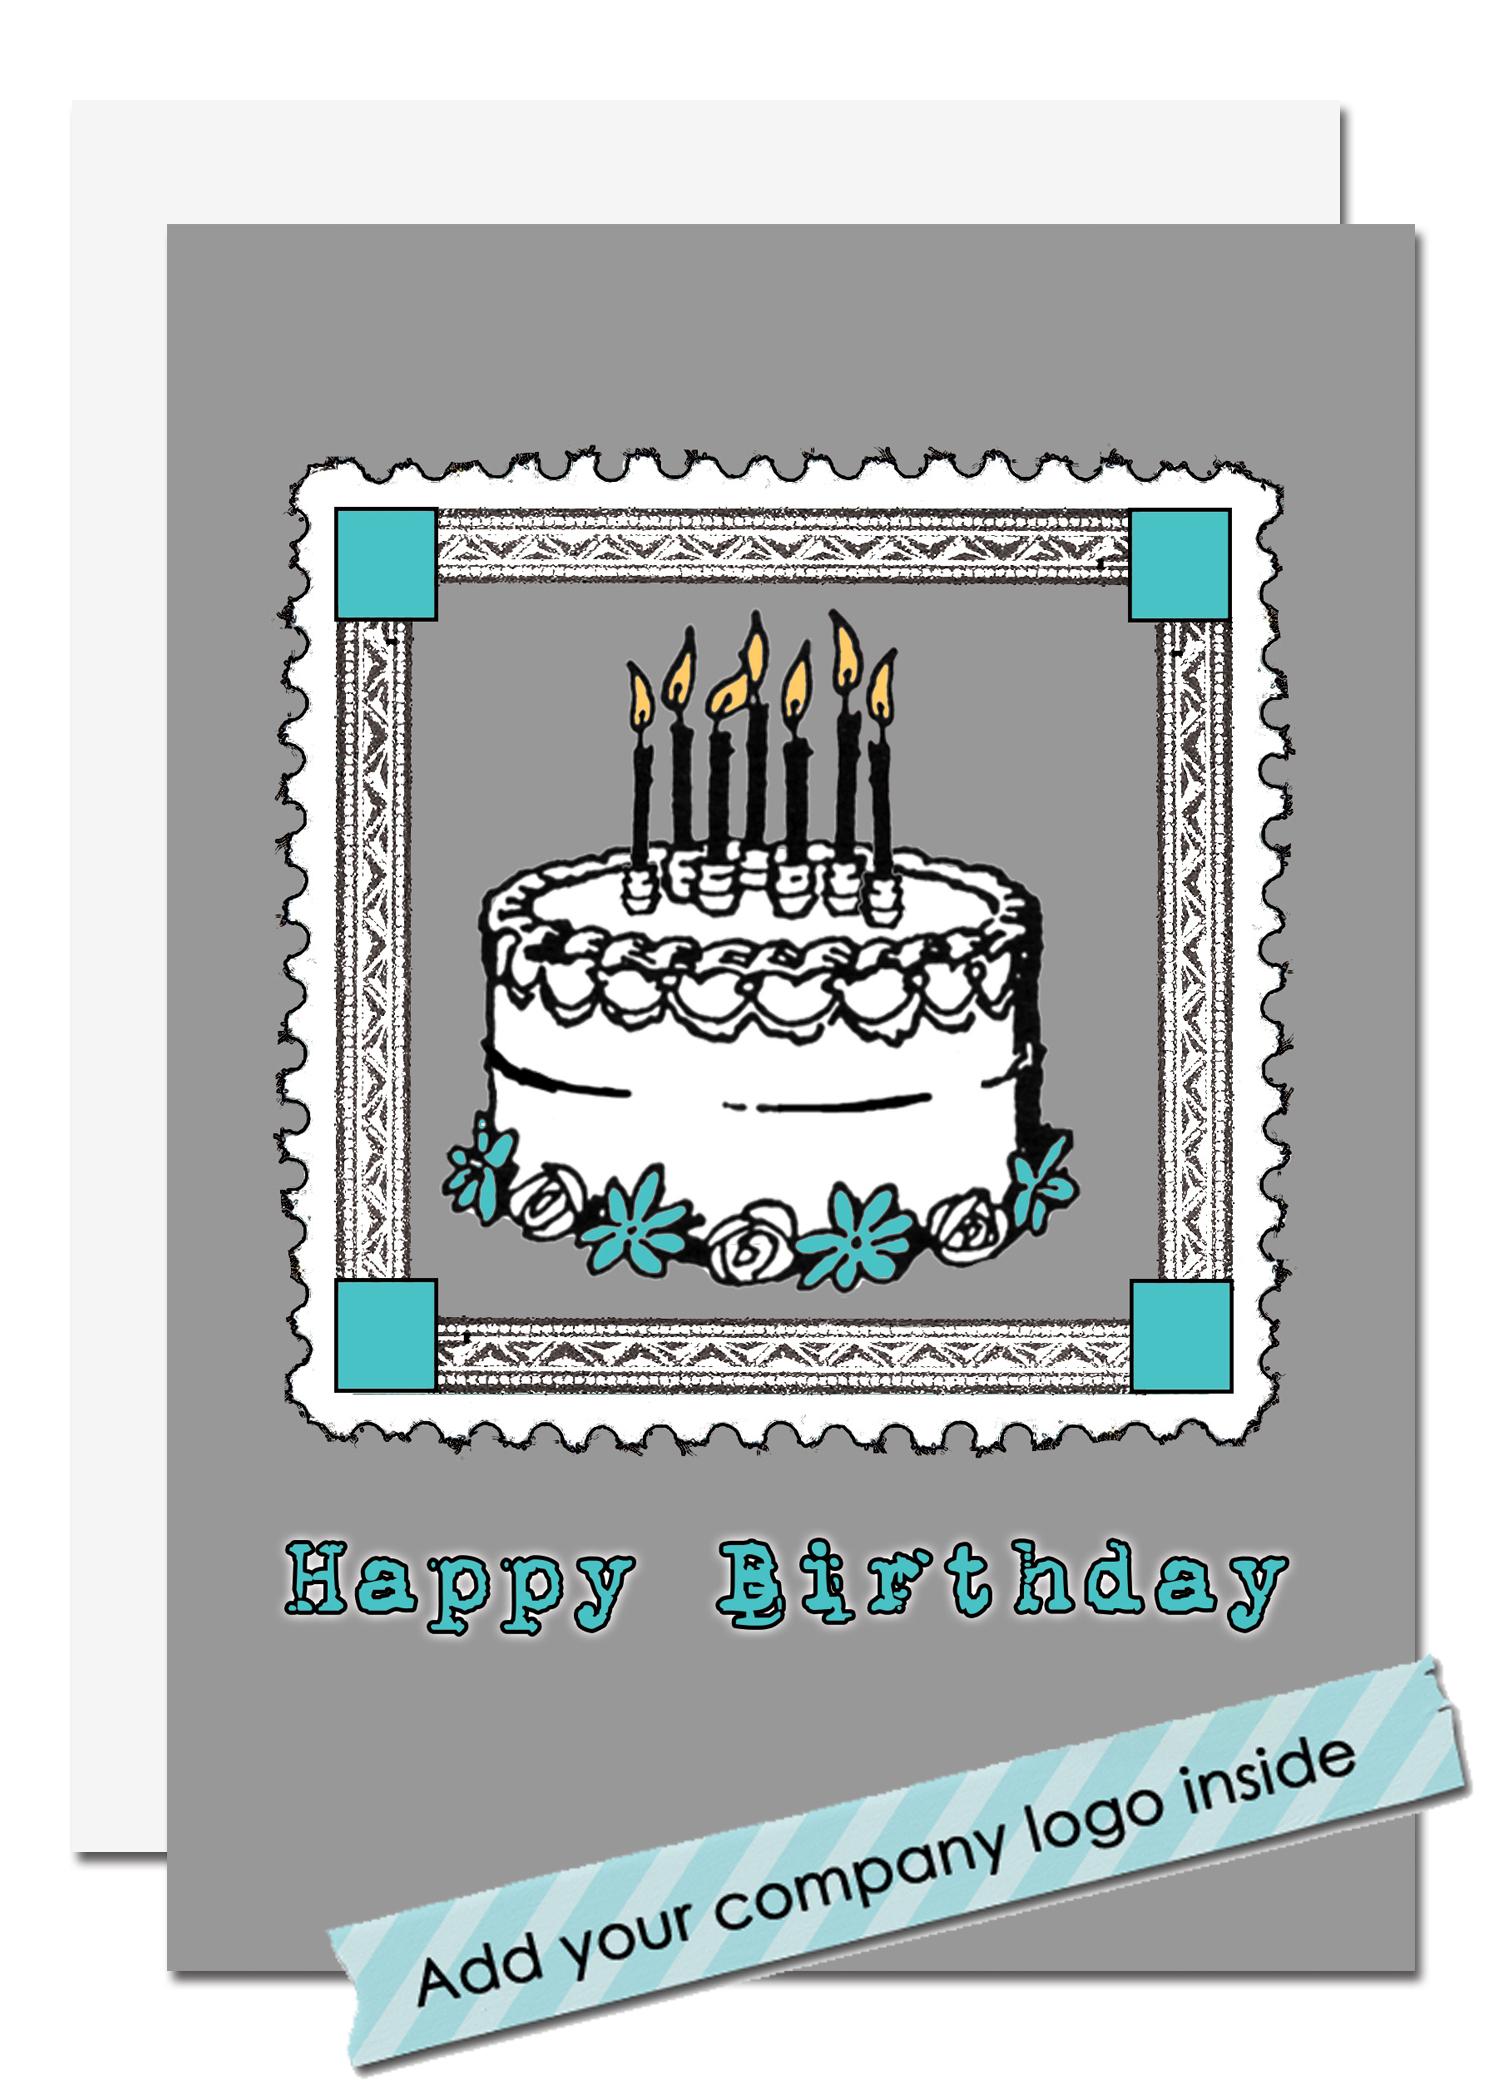 Corporate Birthday Card Sent Well